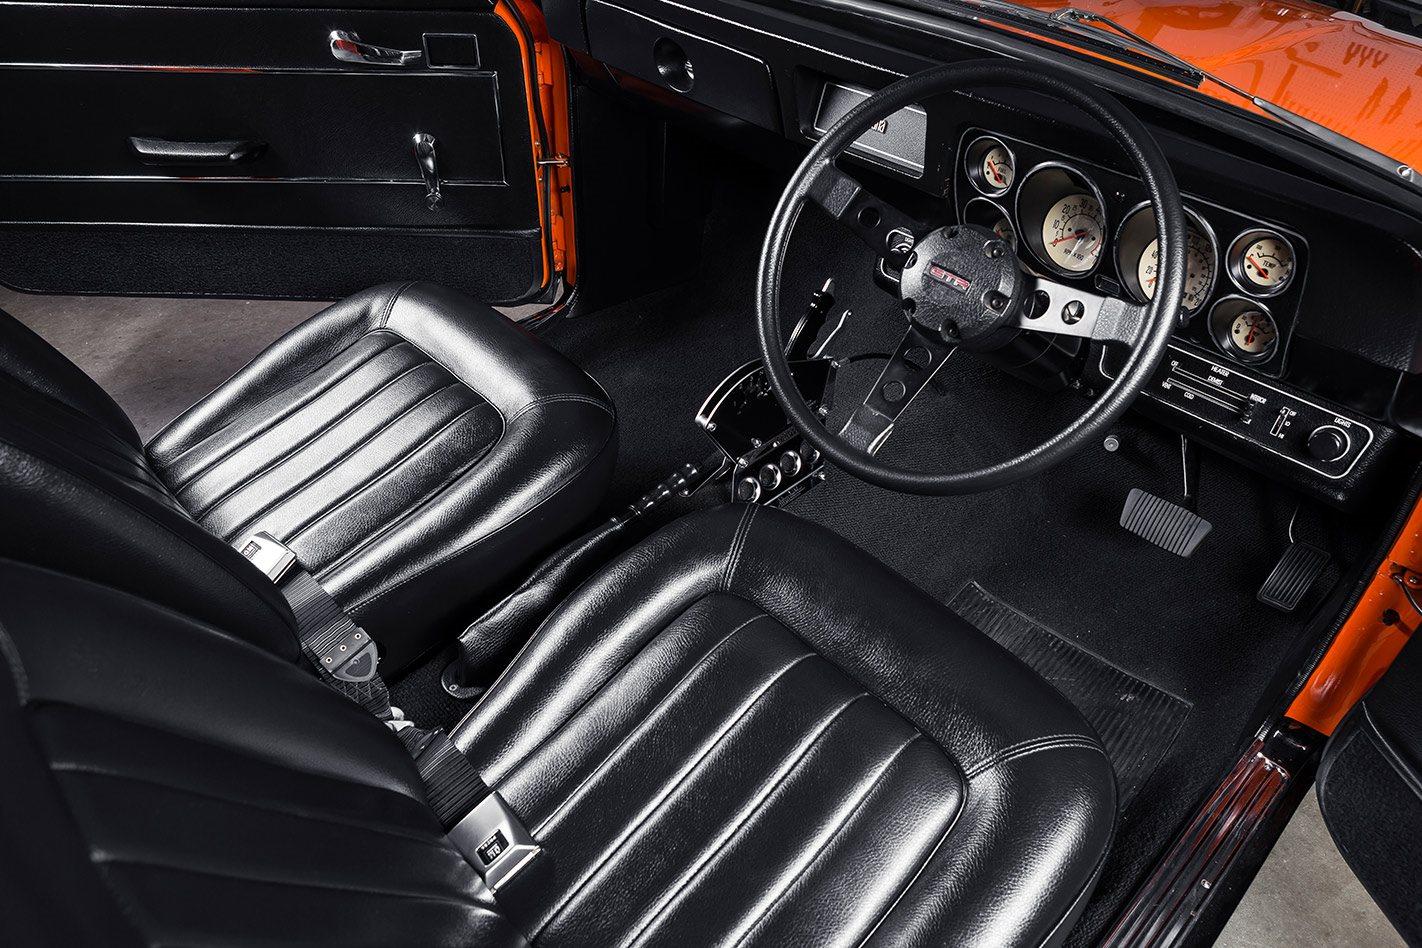 Six Litre V8 1973 Holden Lj Torana Gtr Xu 1 Tribute